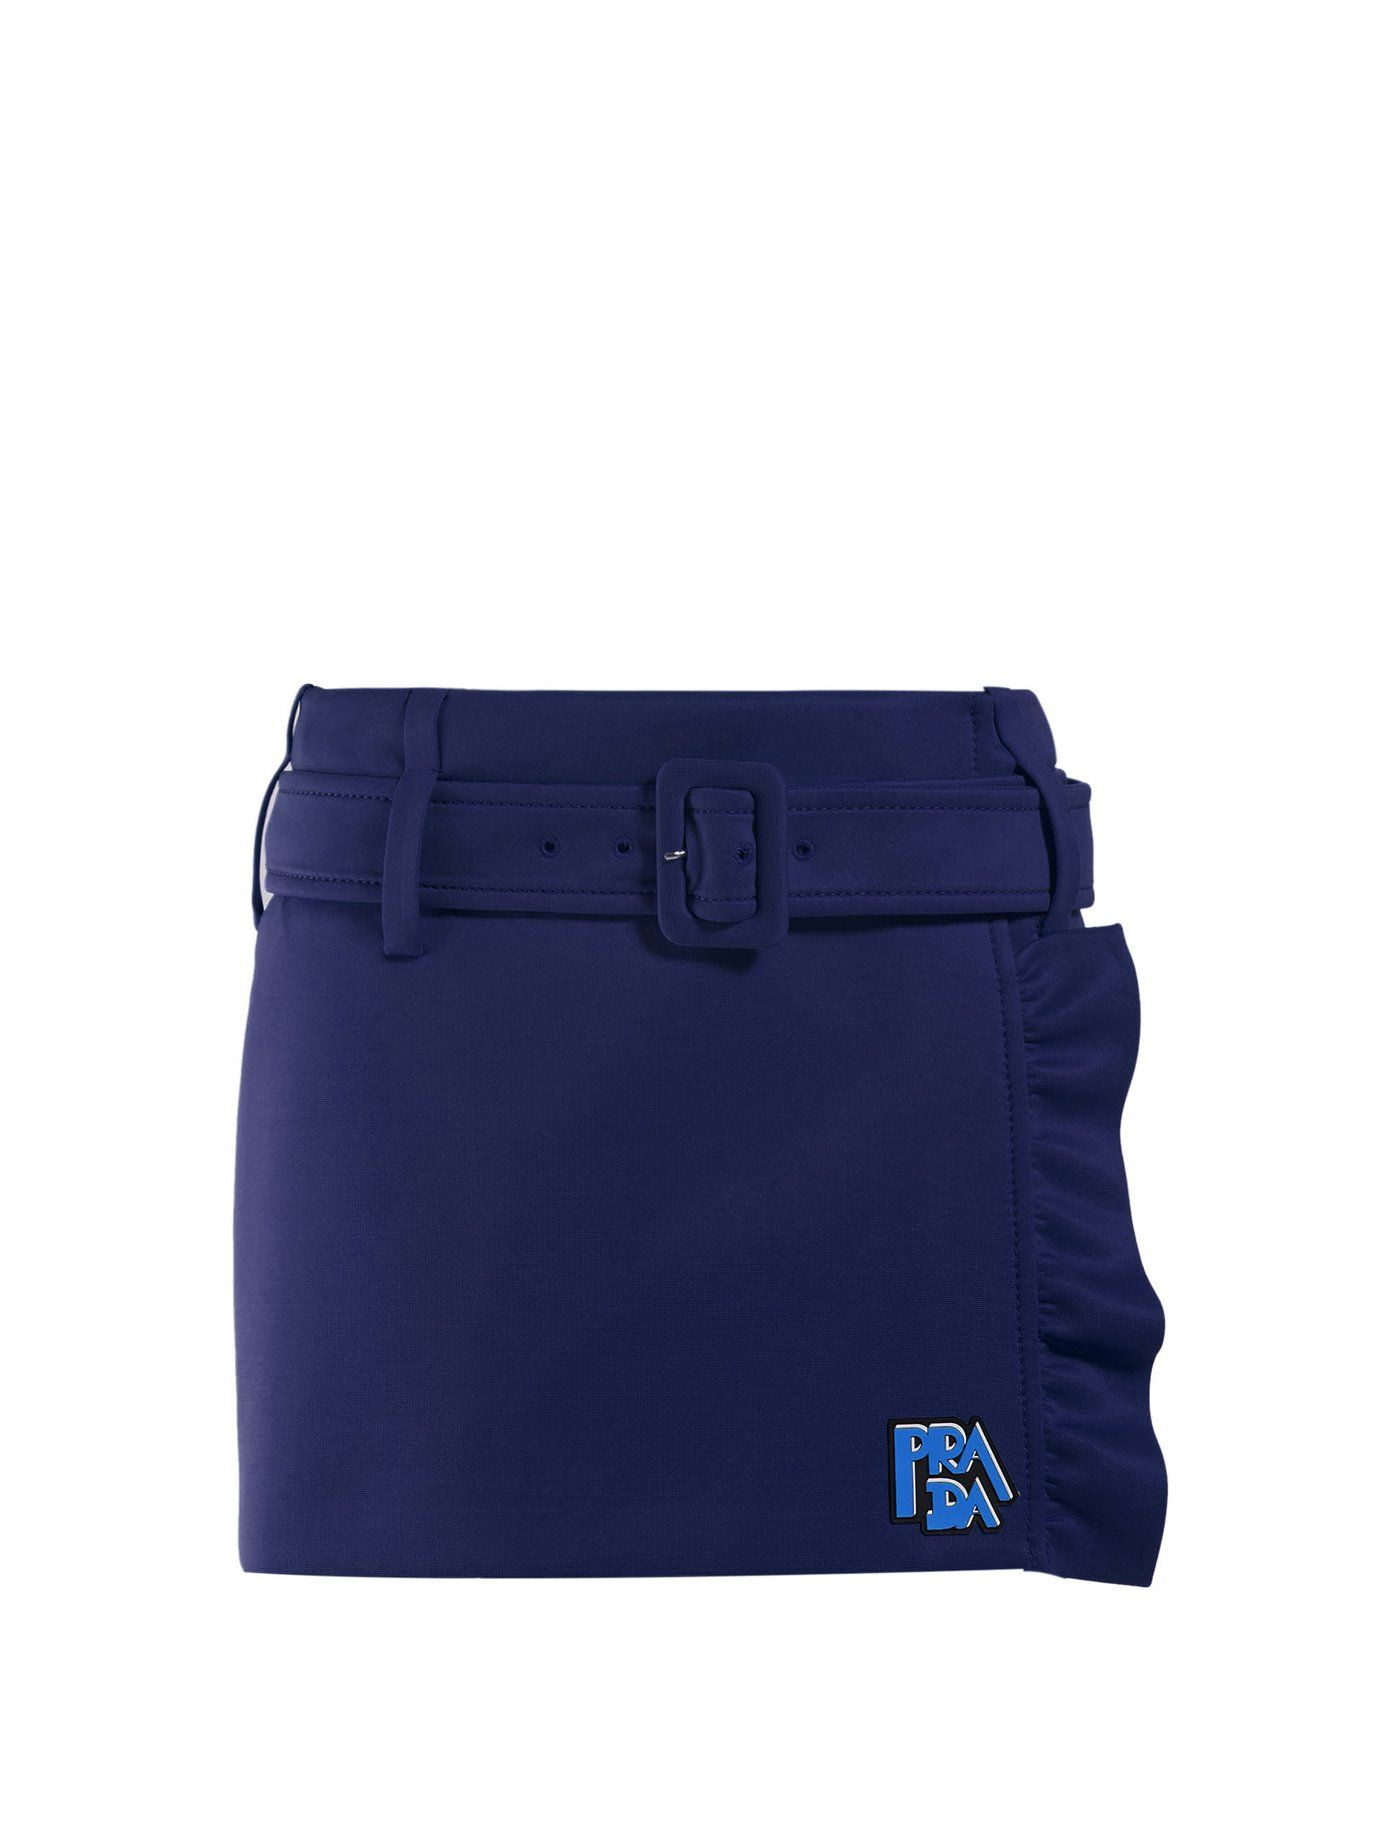 1da68cfe68b2e Belted ruffle-trimmed mini skirt | Prada | MATCHESFASHION.COM US ...